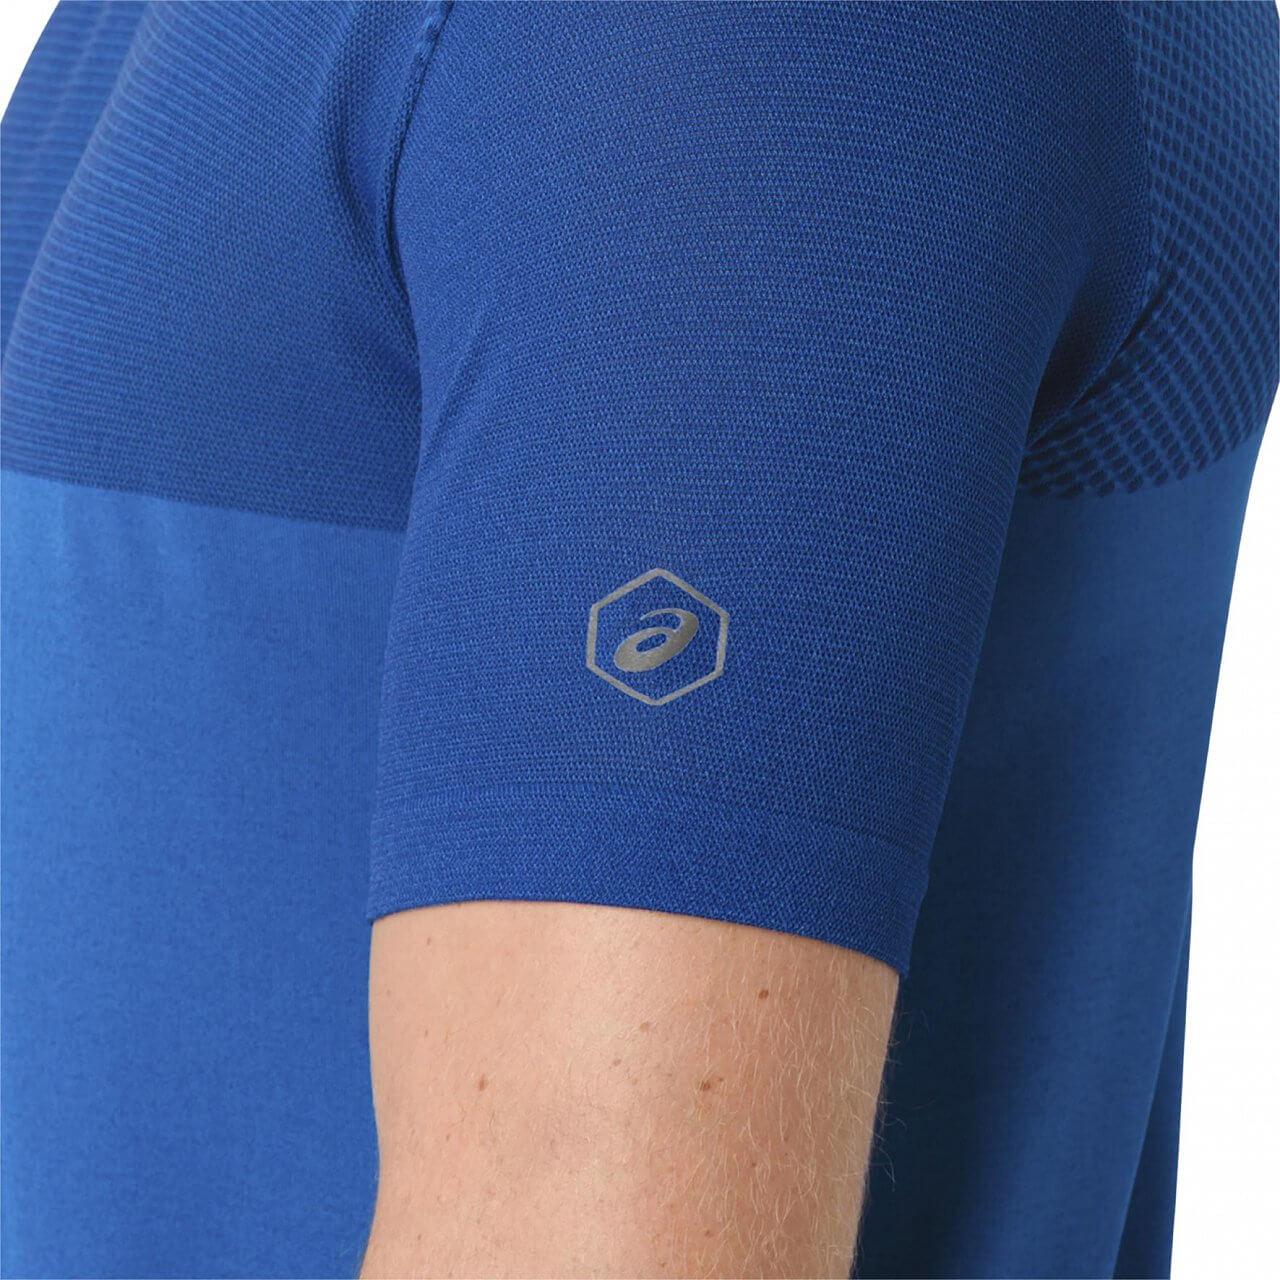 Asics-FuzeX-Seamless-Short-Sleeve-Mens-Running-Fitness-Shirt-Top thumbnail 7